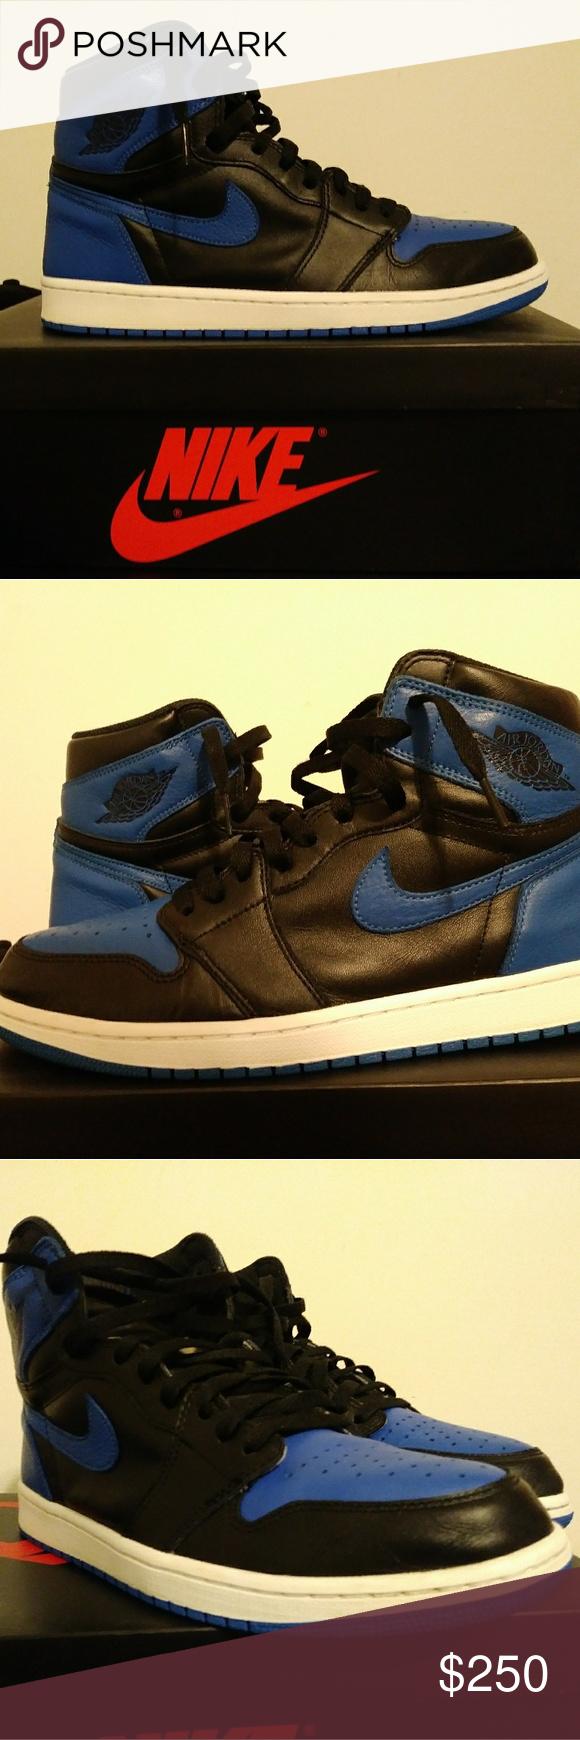 28b7cbccfa8eff JORDAN 1 ROYAL SZ 10.5 VNDS Worn 2x no heel drag or scuffs JORDAN BRAND  Shoes Sneakers